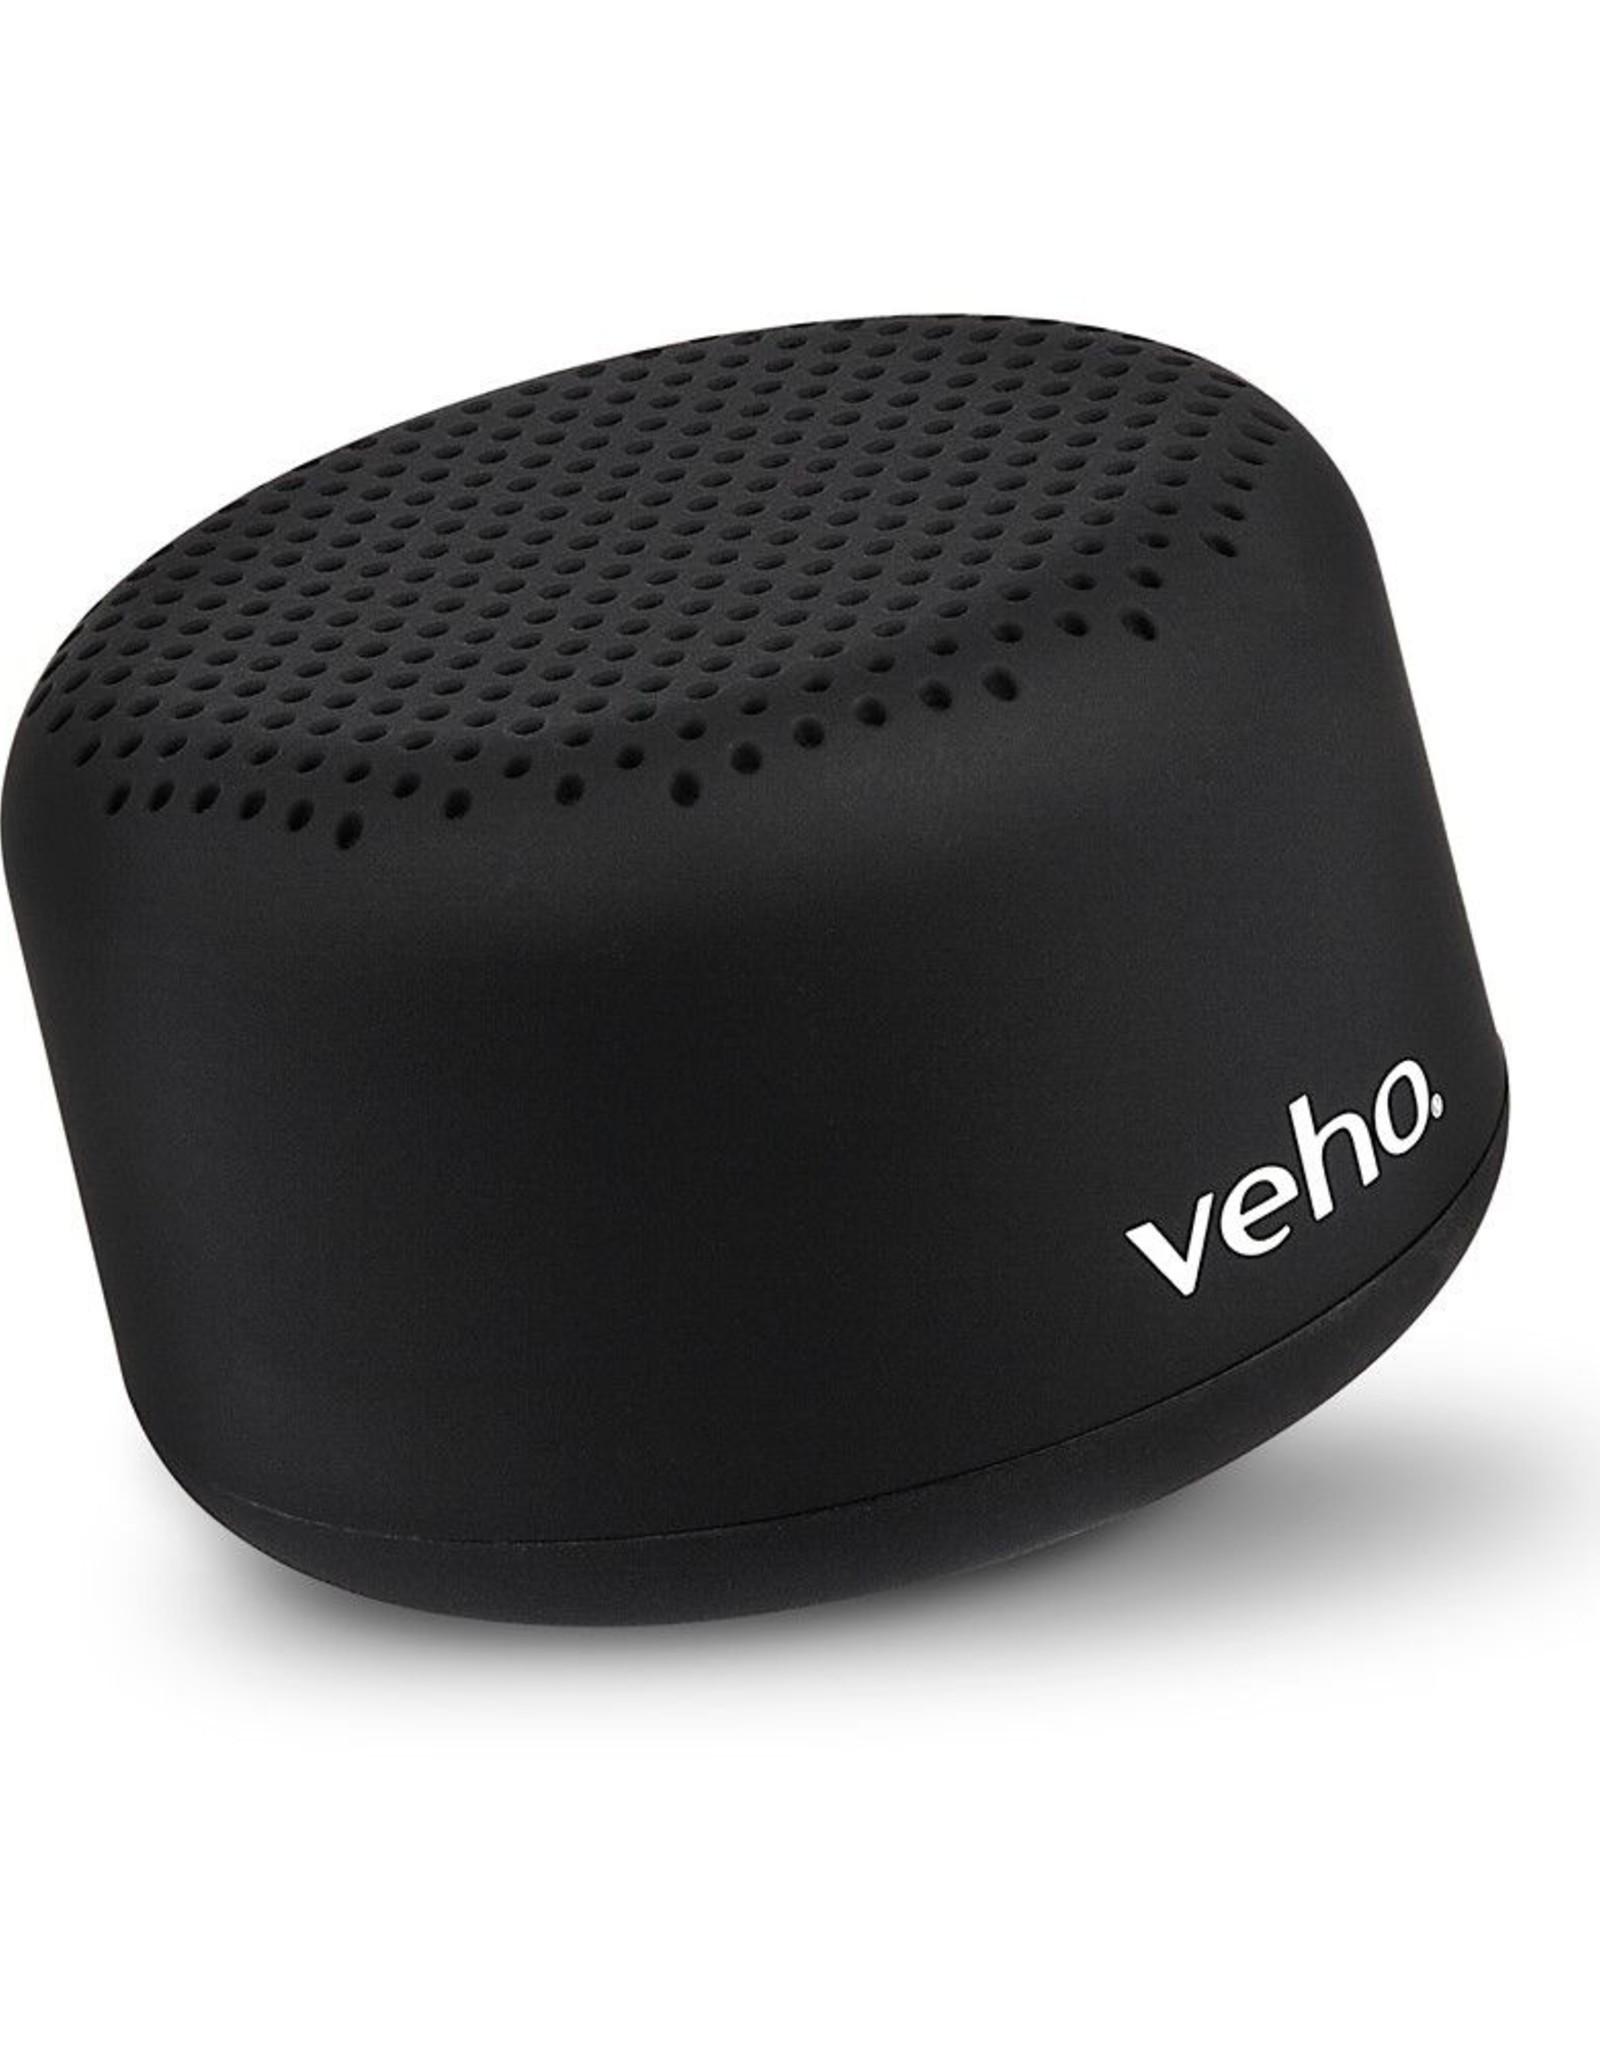 Veho Veho M2 Portable Wireless Bluetooth Speaker